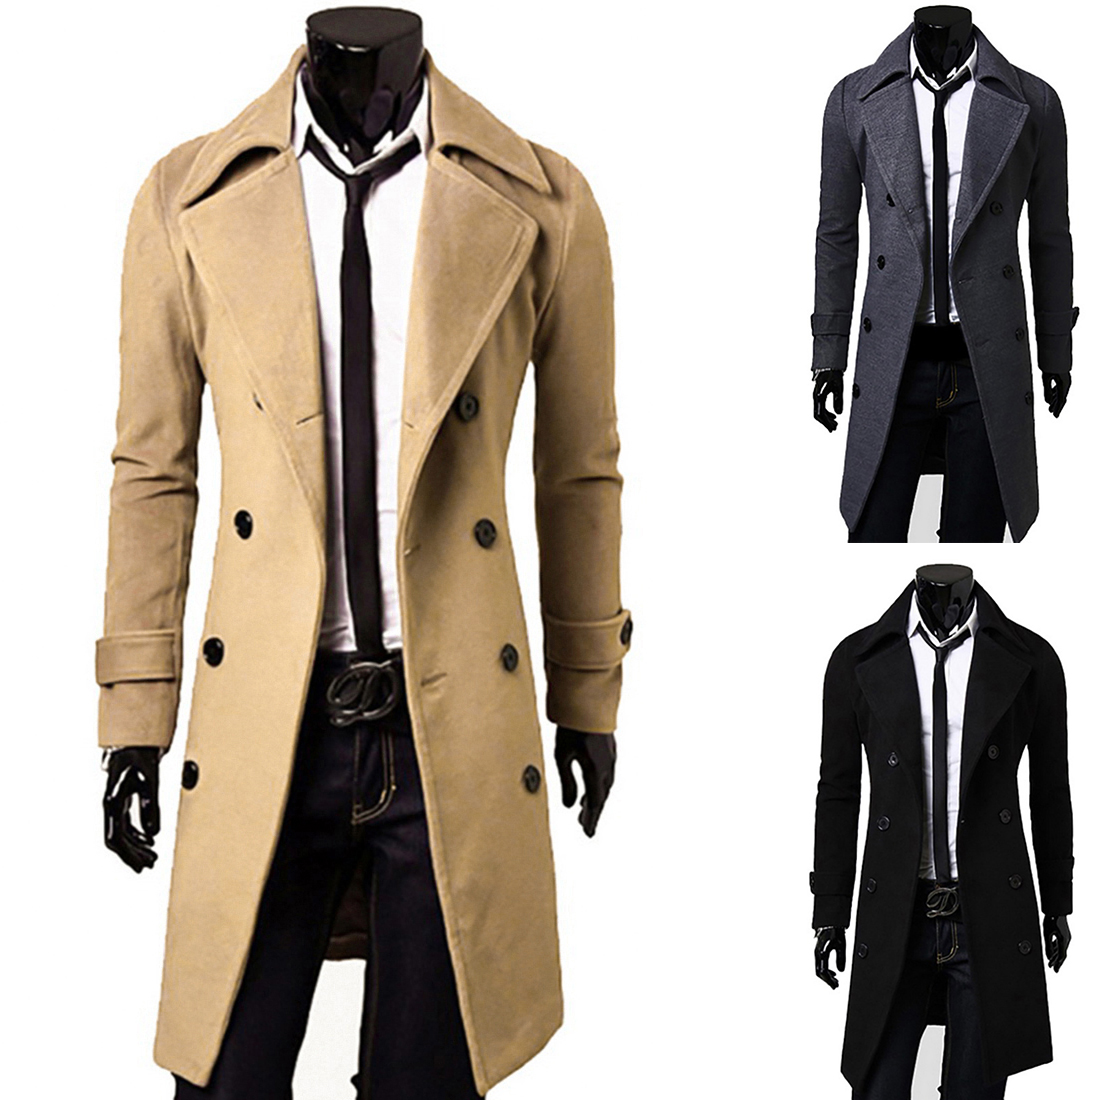 MJARTORIA 2020 Trench Coat Mens Classic Double Breasted Mens Long Coat Masculino Clothing Long Jackets Coats British Overcoat